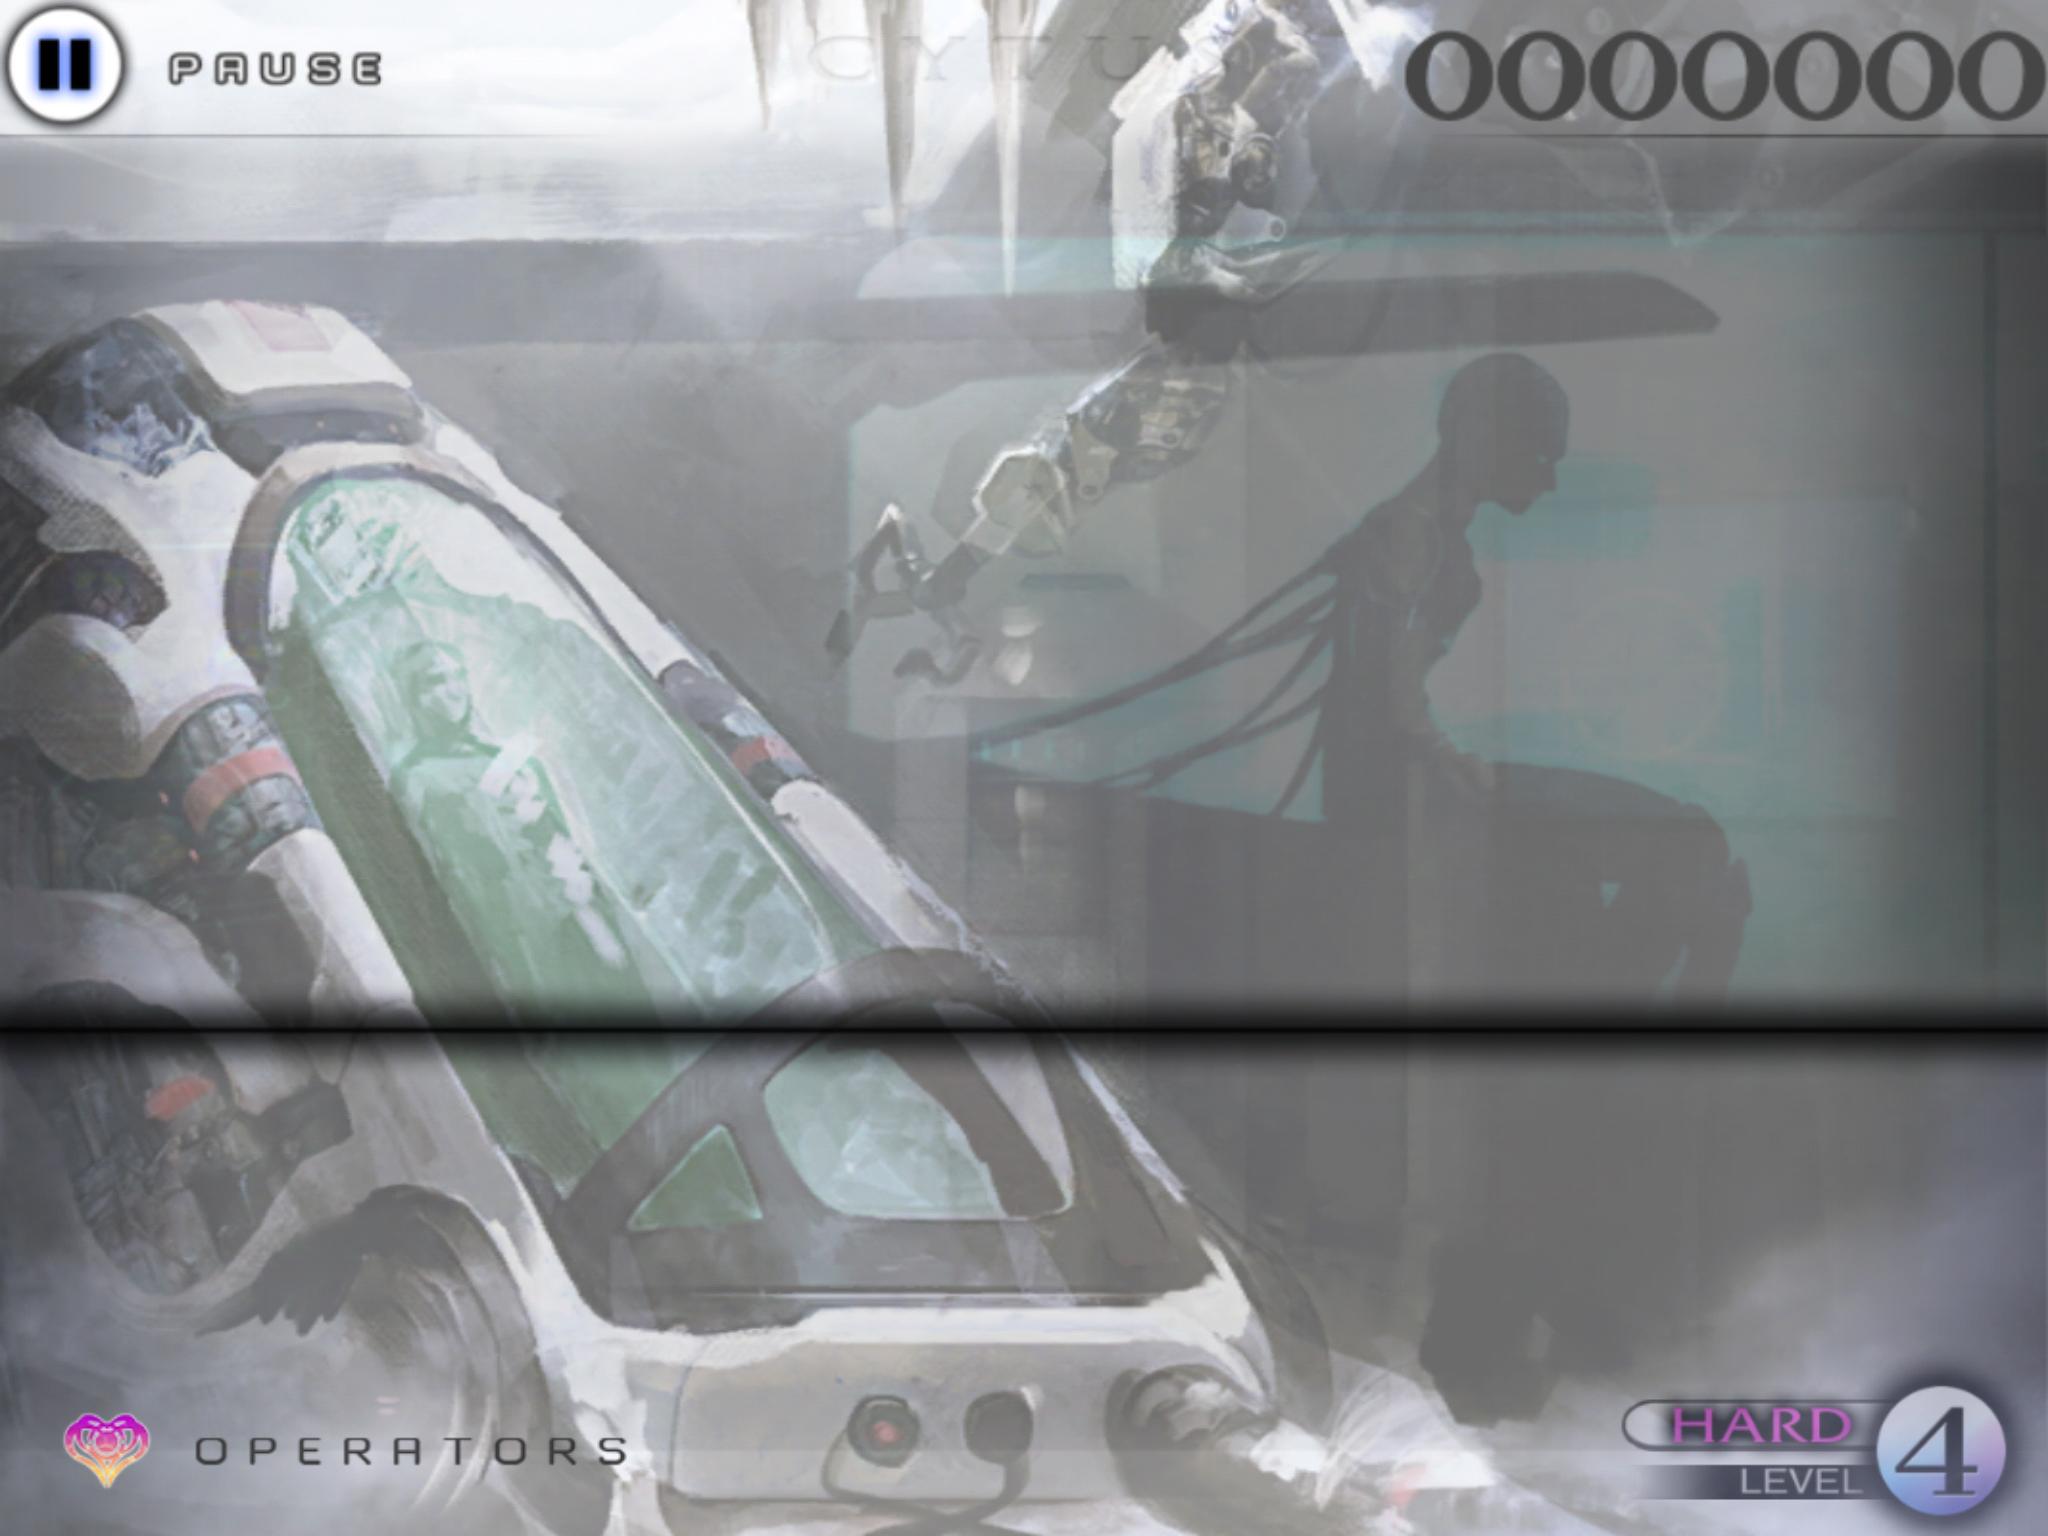 Alive: Operators